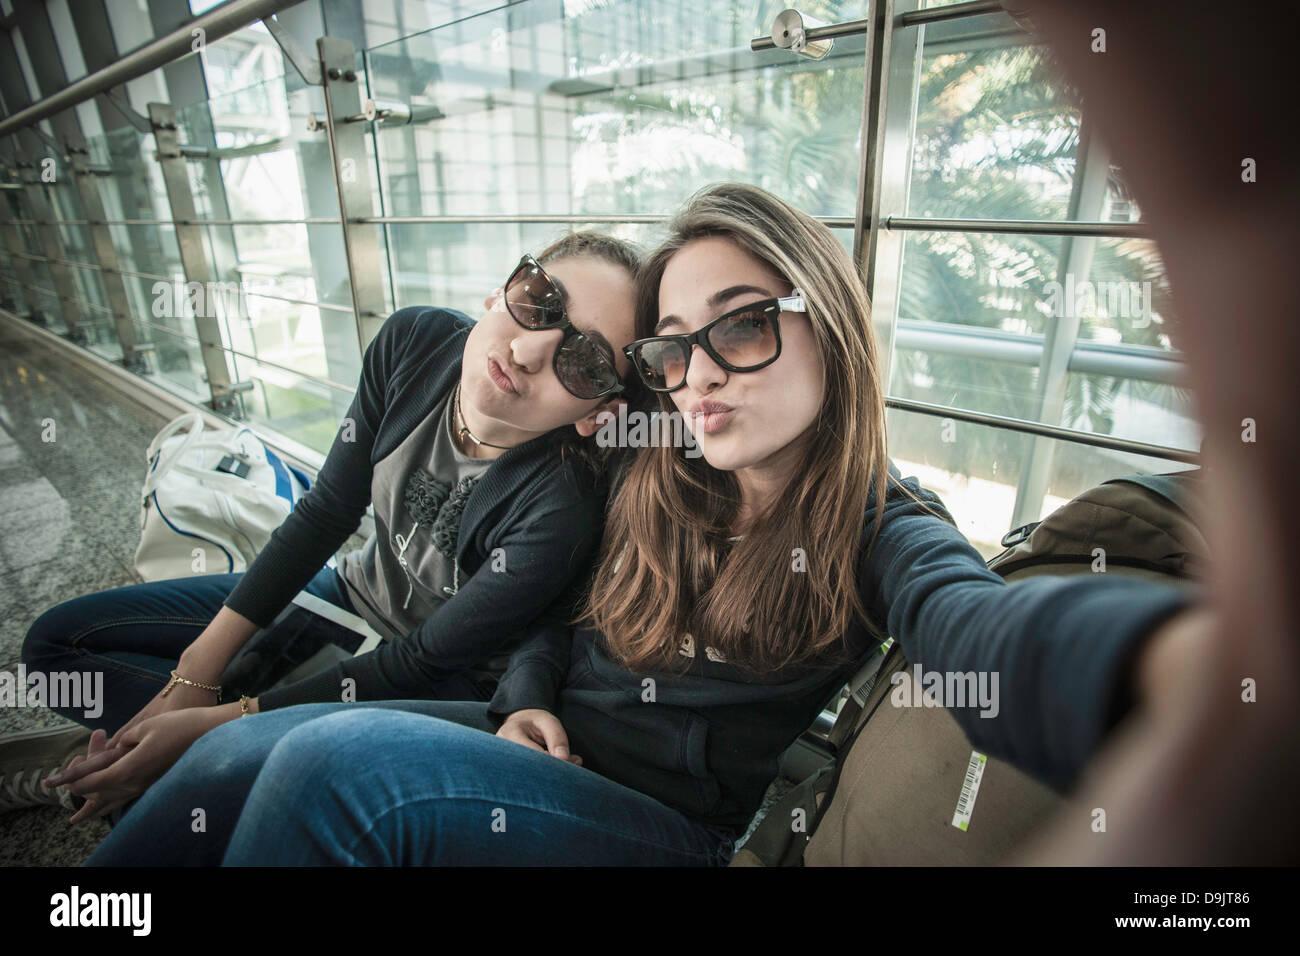 Zwei Mädchen im Teenageralter, Kamera, posieren Fotografieren selbst Stockbild